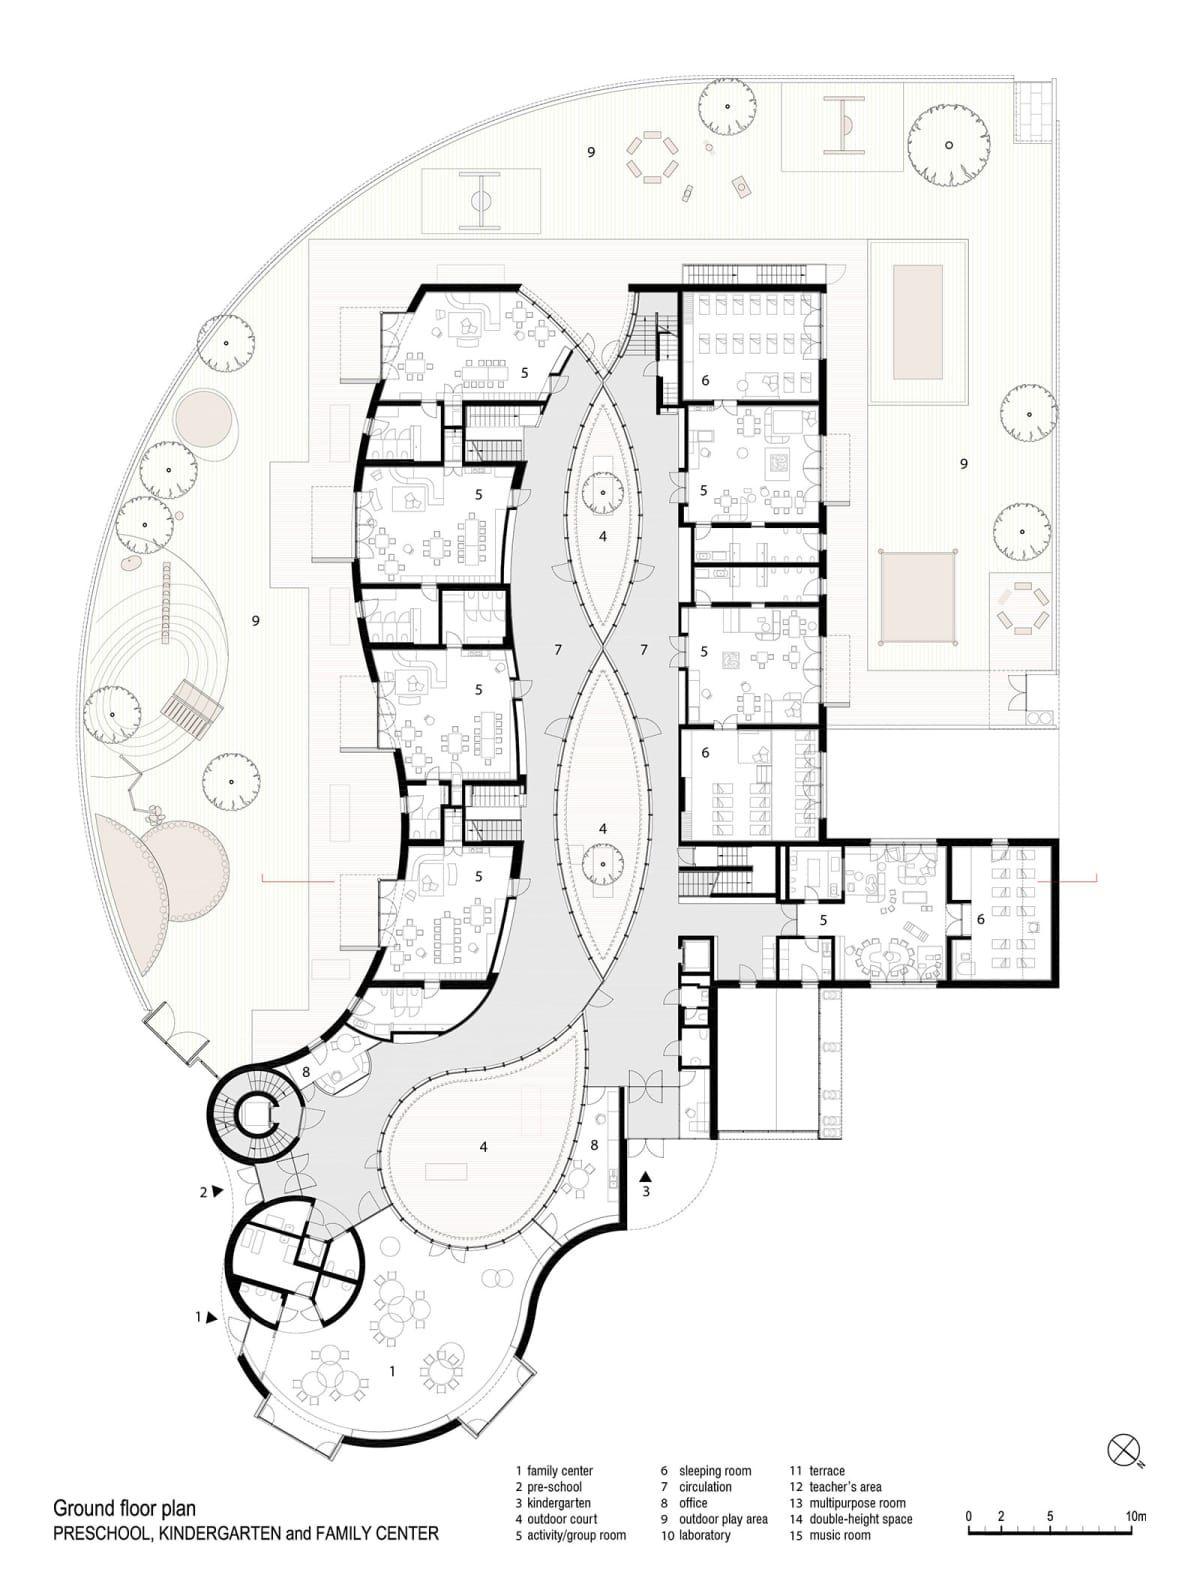 Modus architects · preschool kindergarten and family center